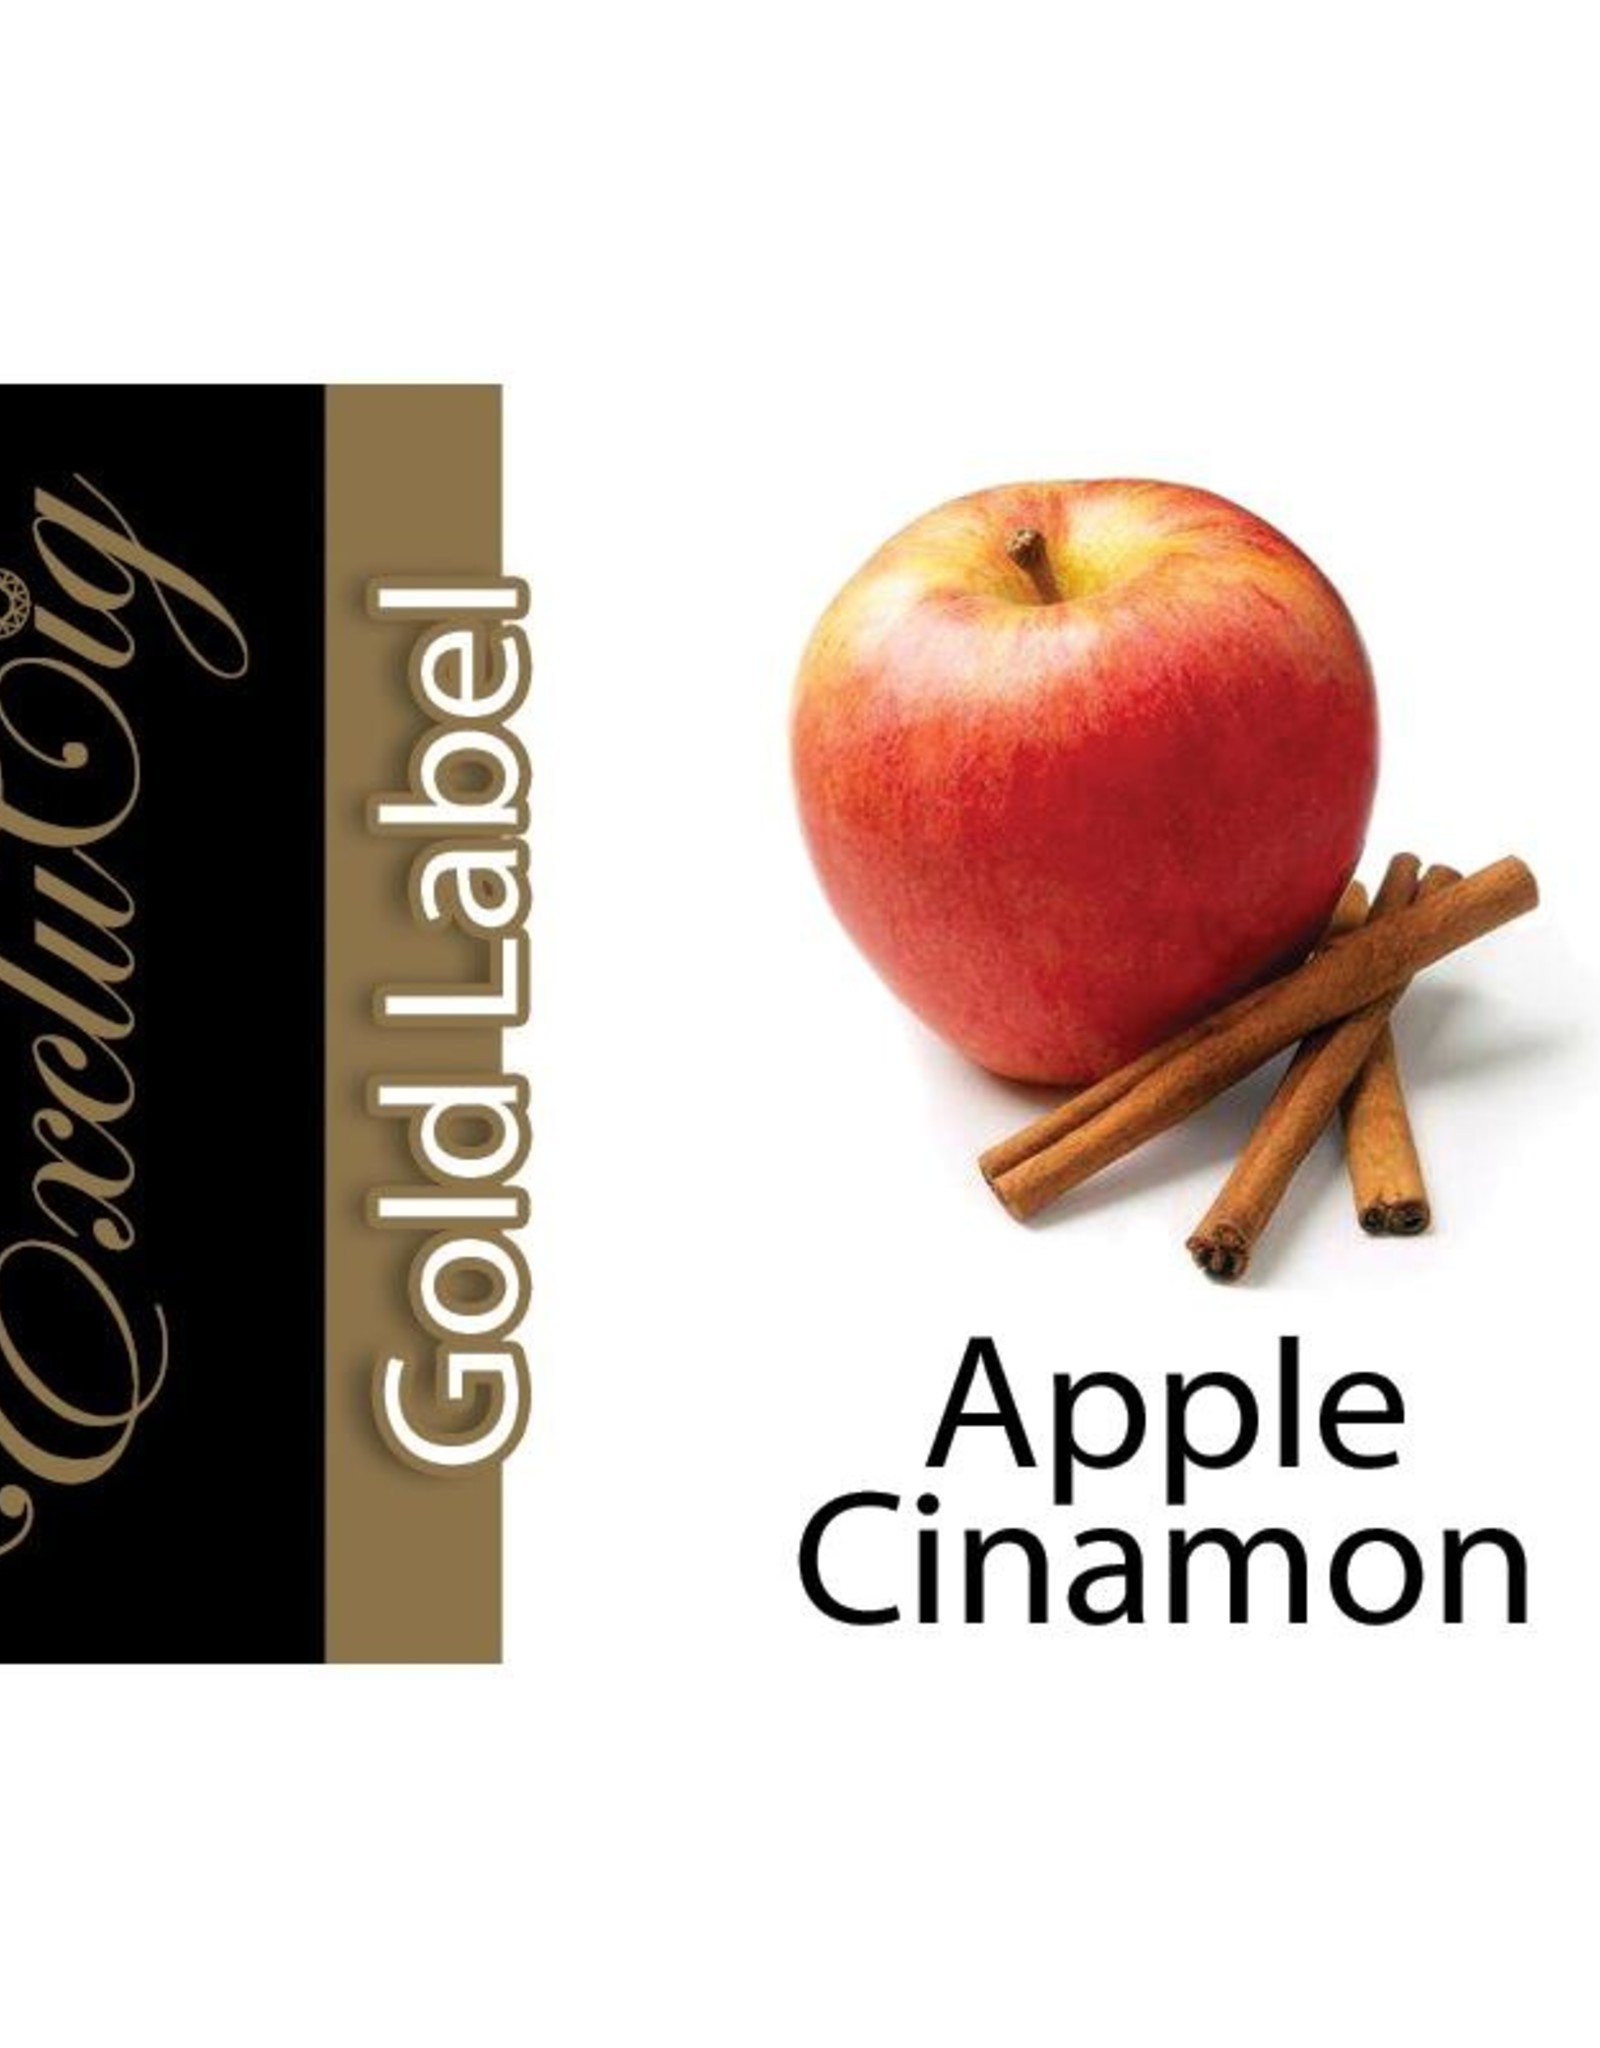 Exclucig Exclucig Gold Label E-liquid Apple Cinamon 18 mg Nicotine